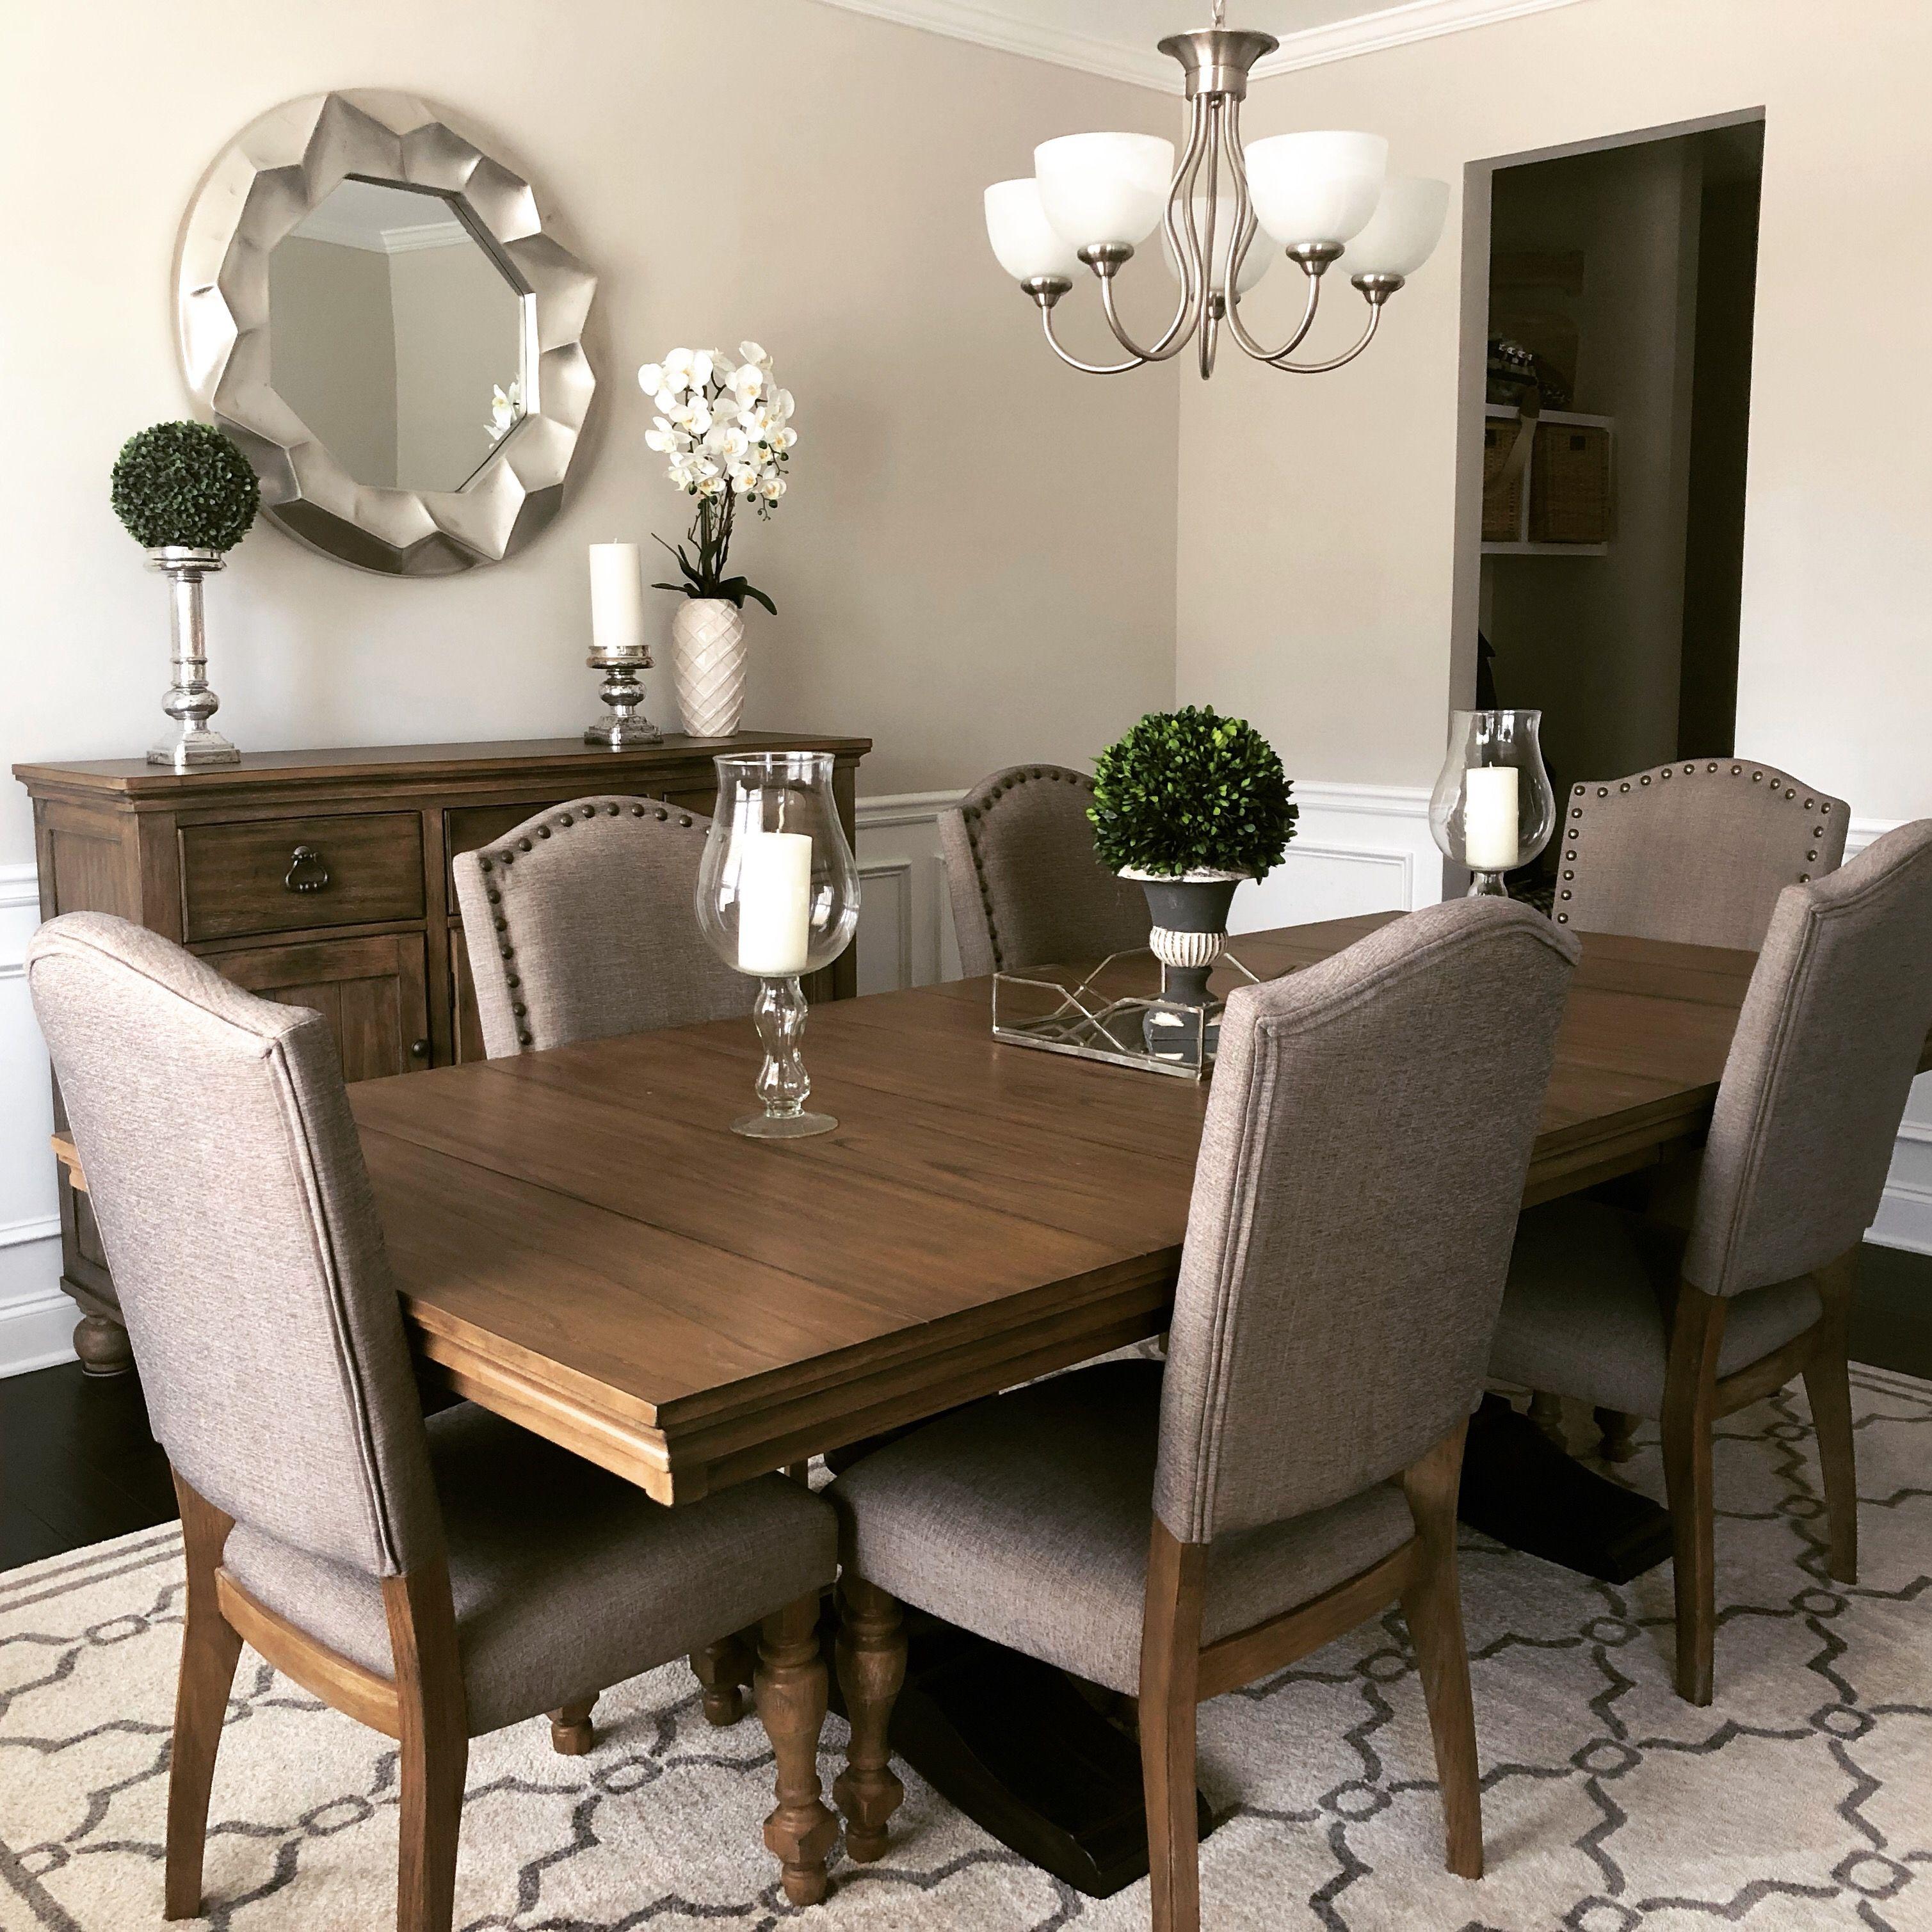 Modern Farmhouse Dining Room Decor Ashley Furniture Table